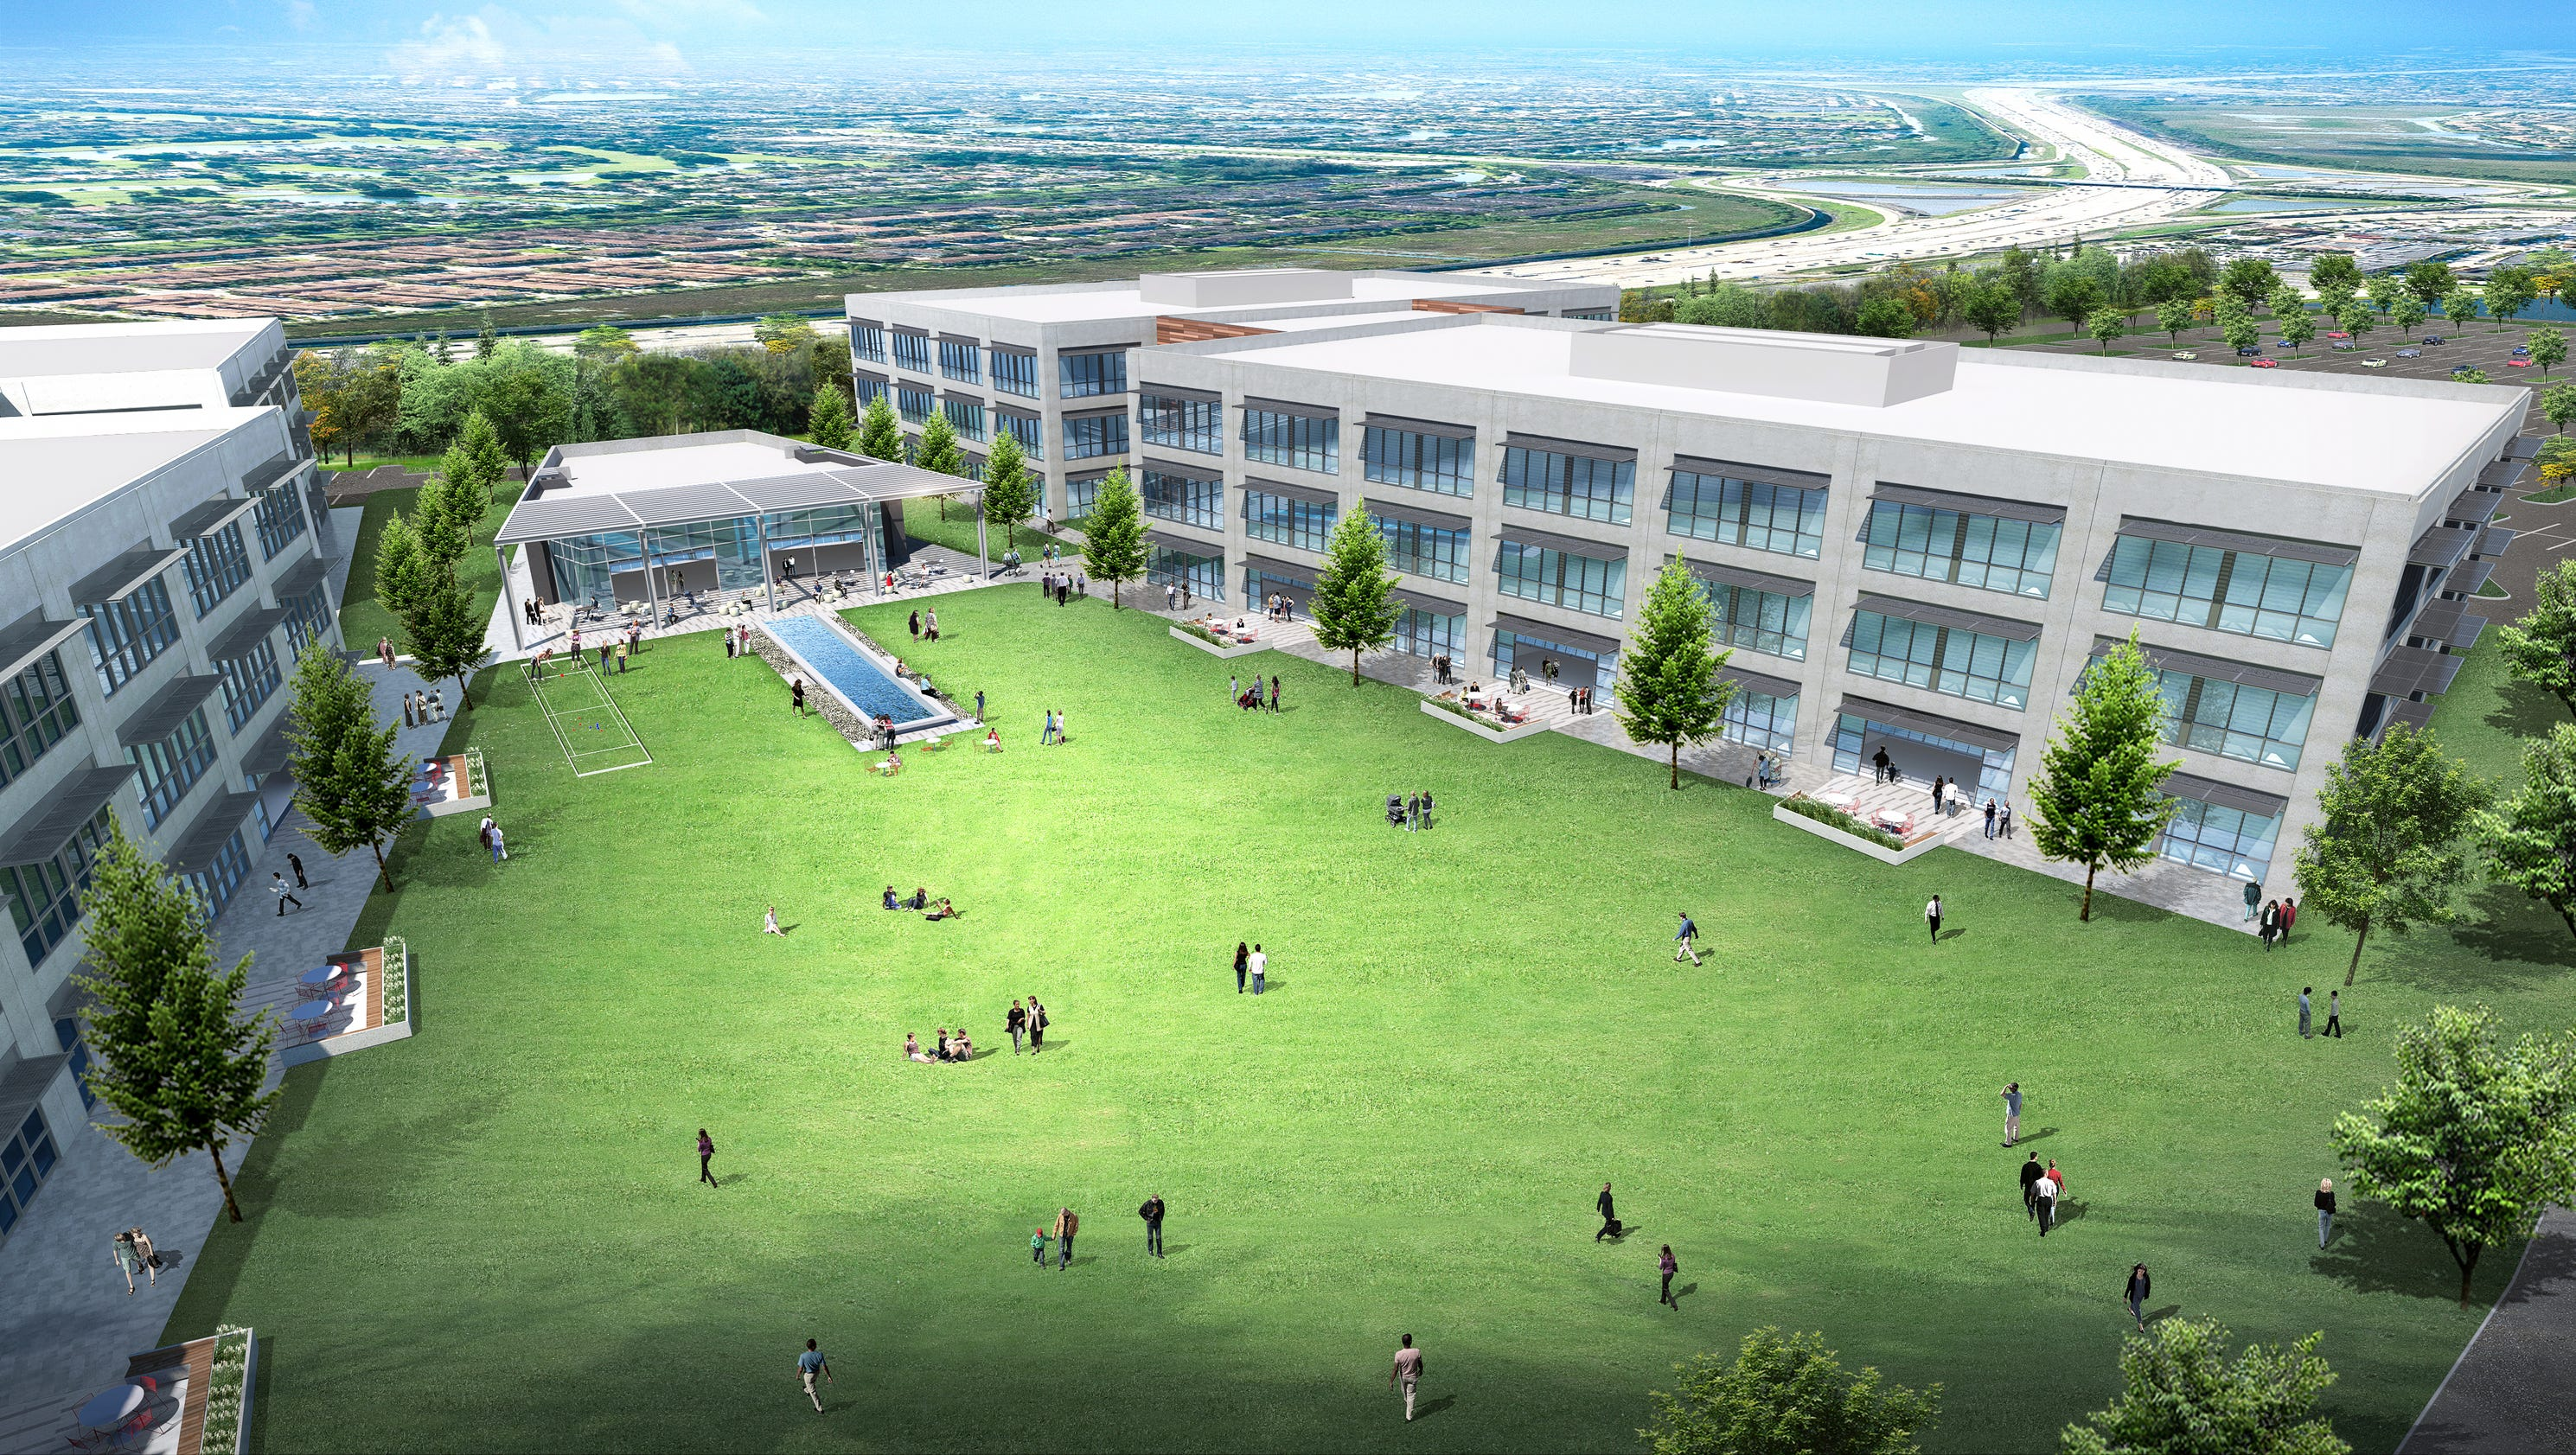 Gartner To Build New Campus Double Workforce